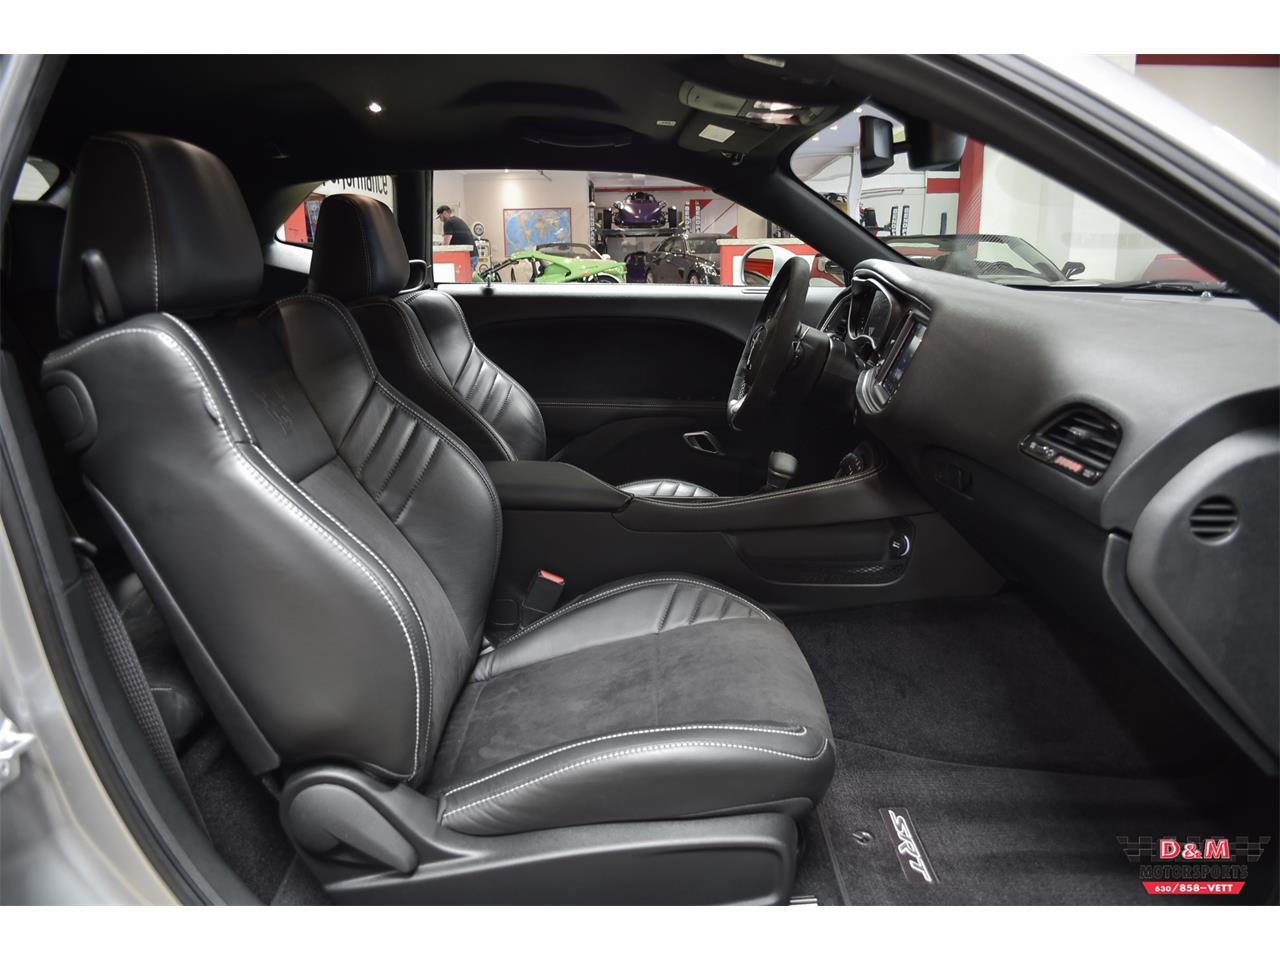 2018 Dodge Challenger (CC-1391428) for sale in Glen Ellyn, Illinois